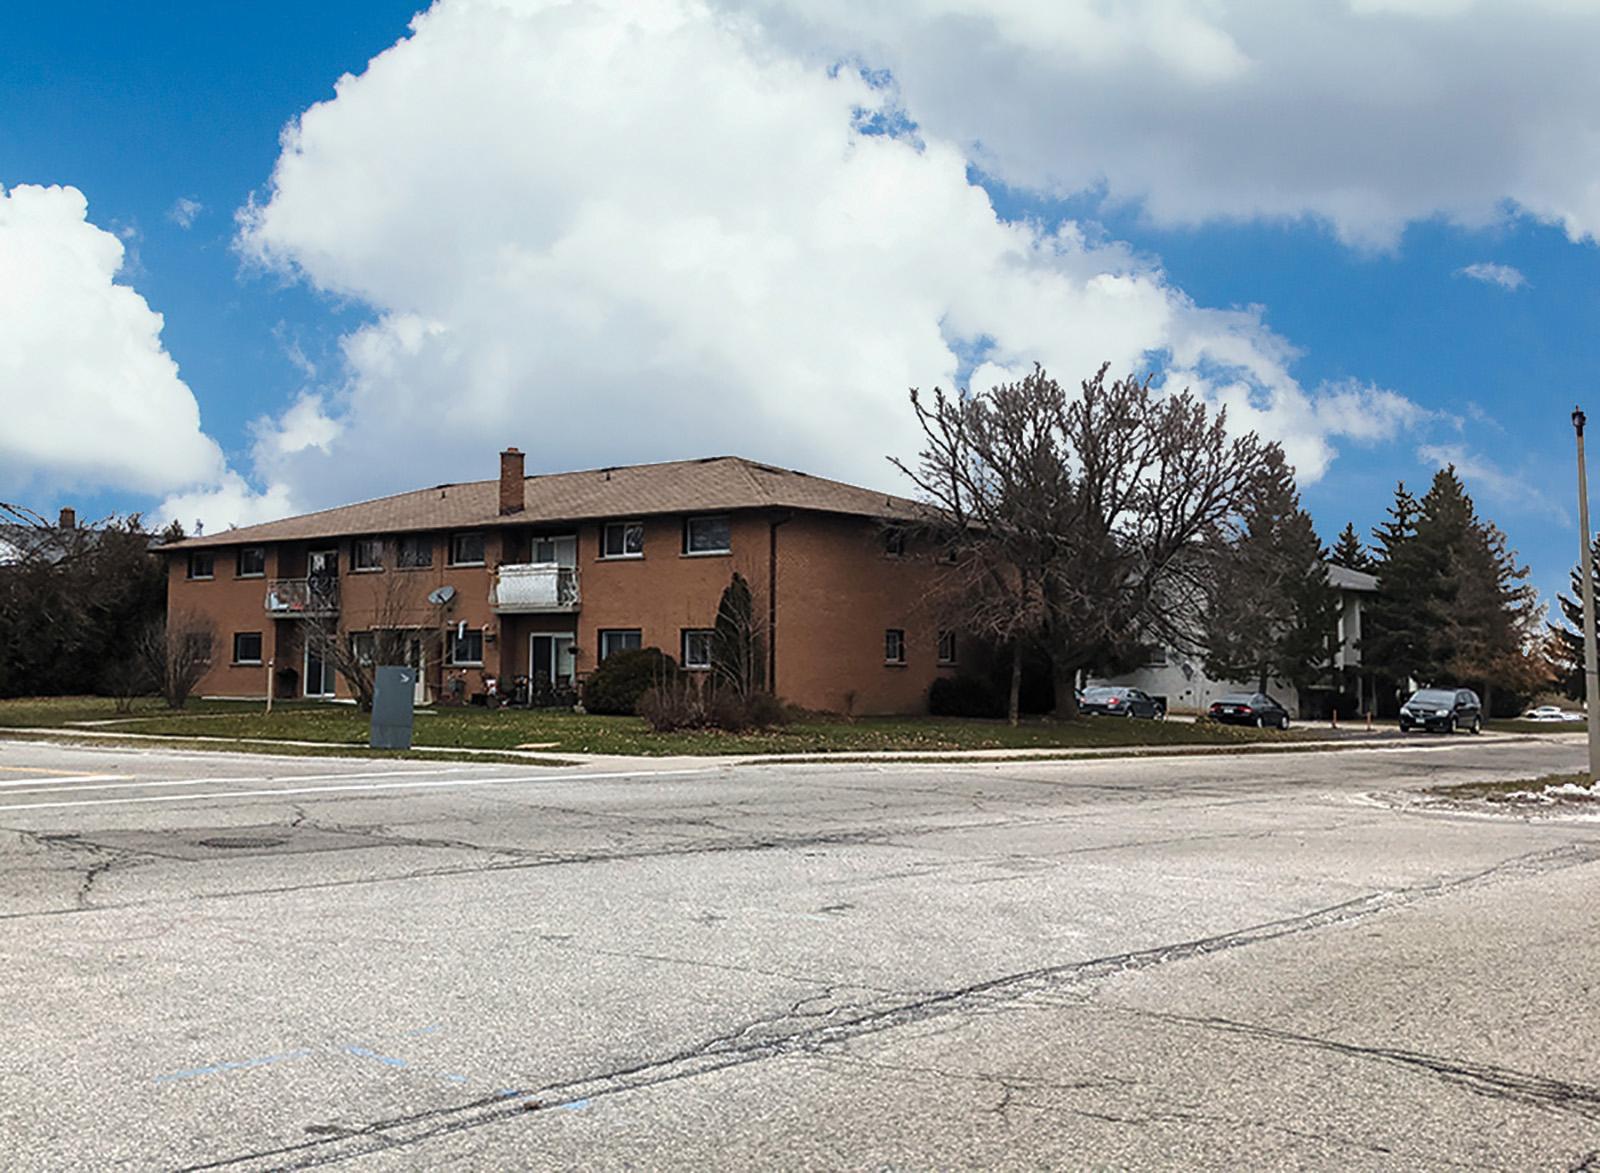 8 Unit Apartment Building – Waterloo